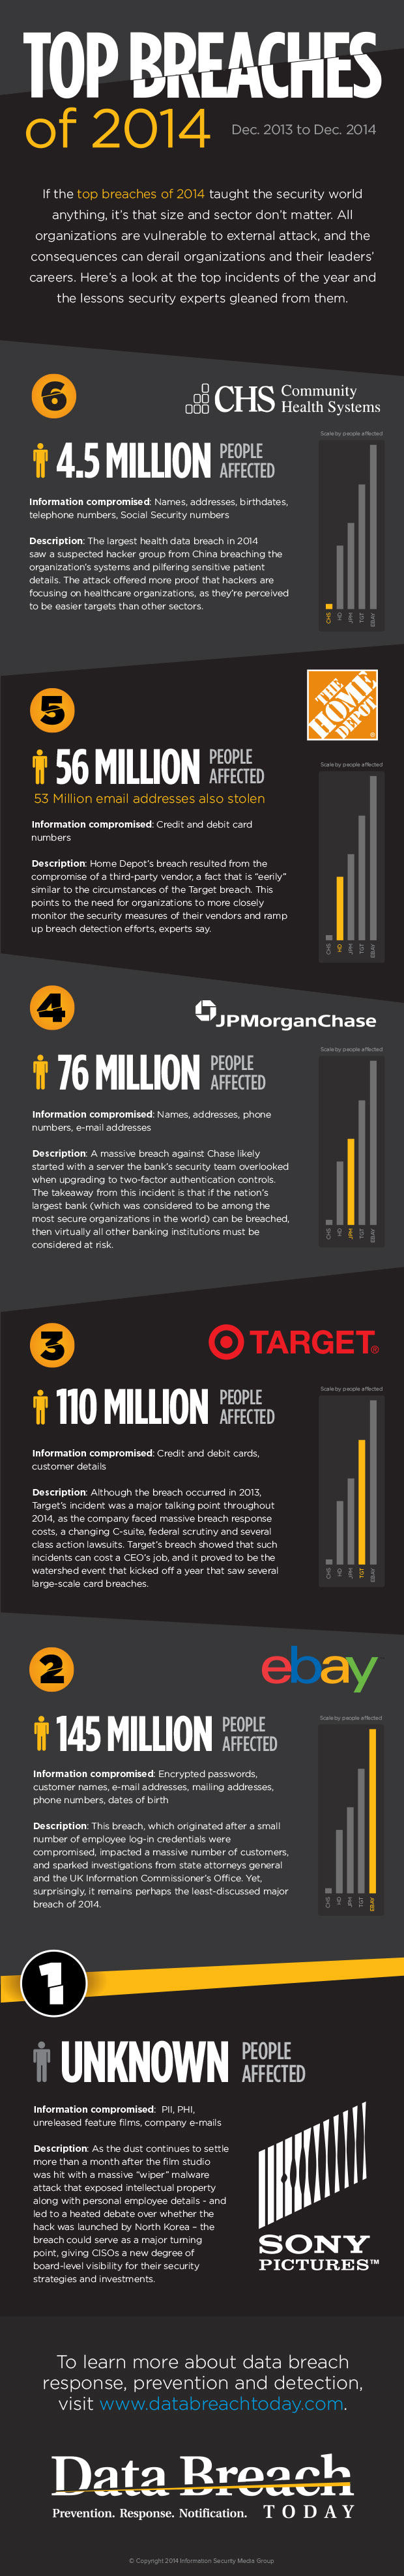 Data protection breaches 2014